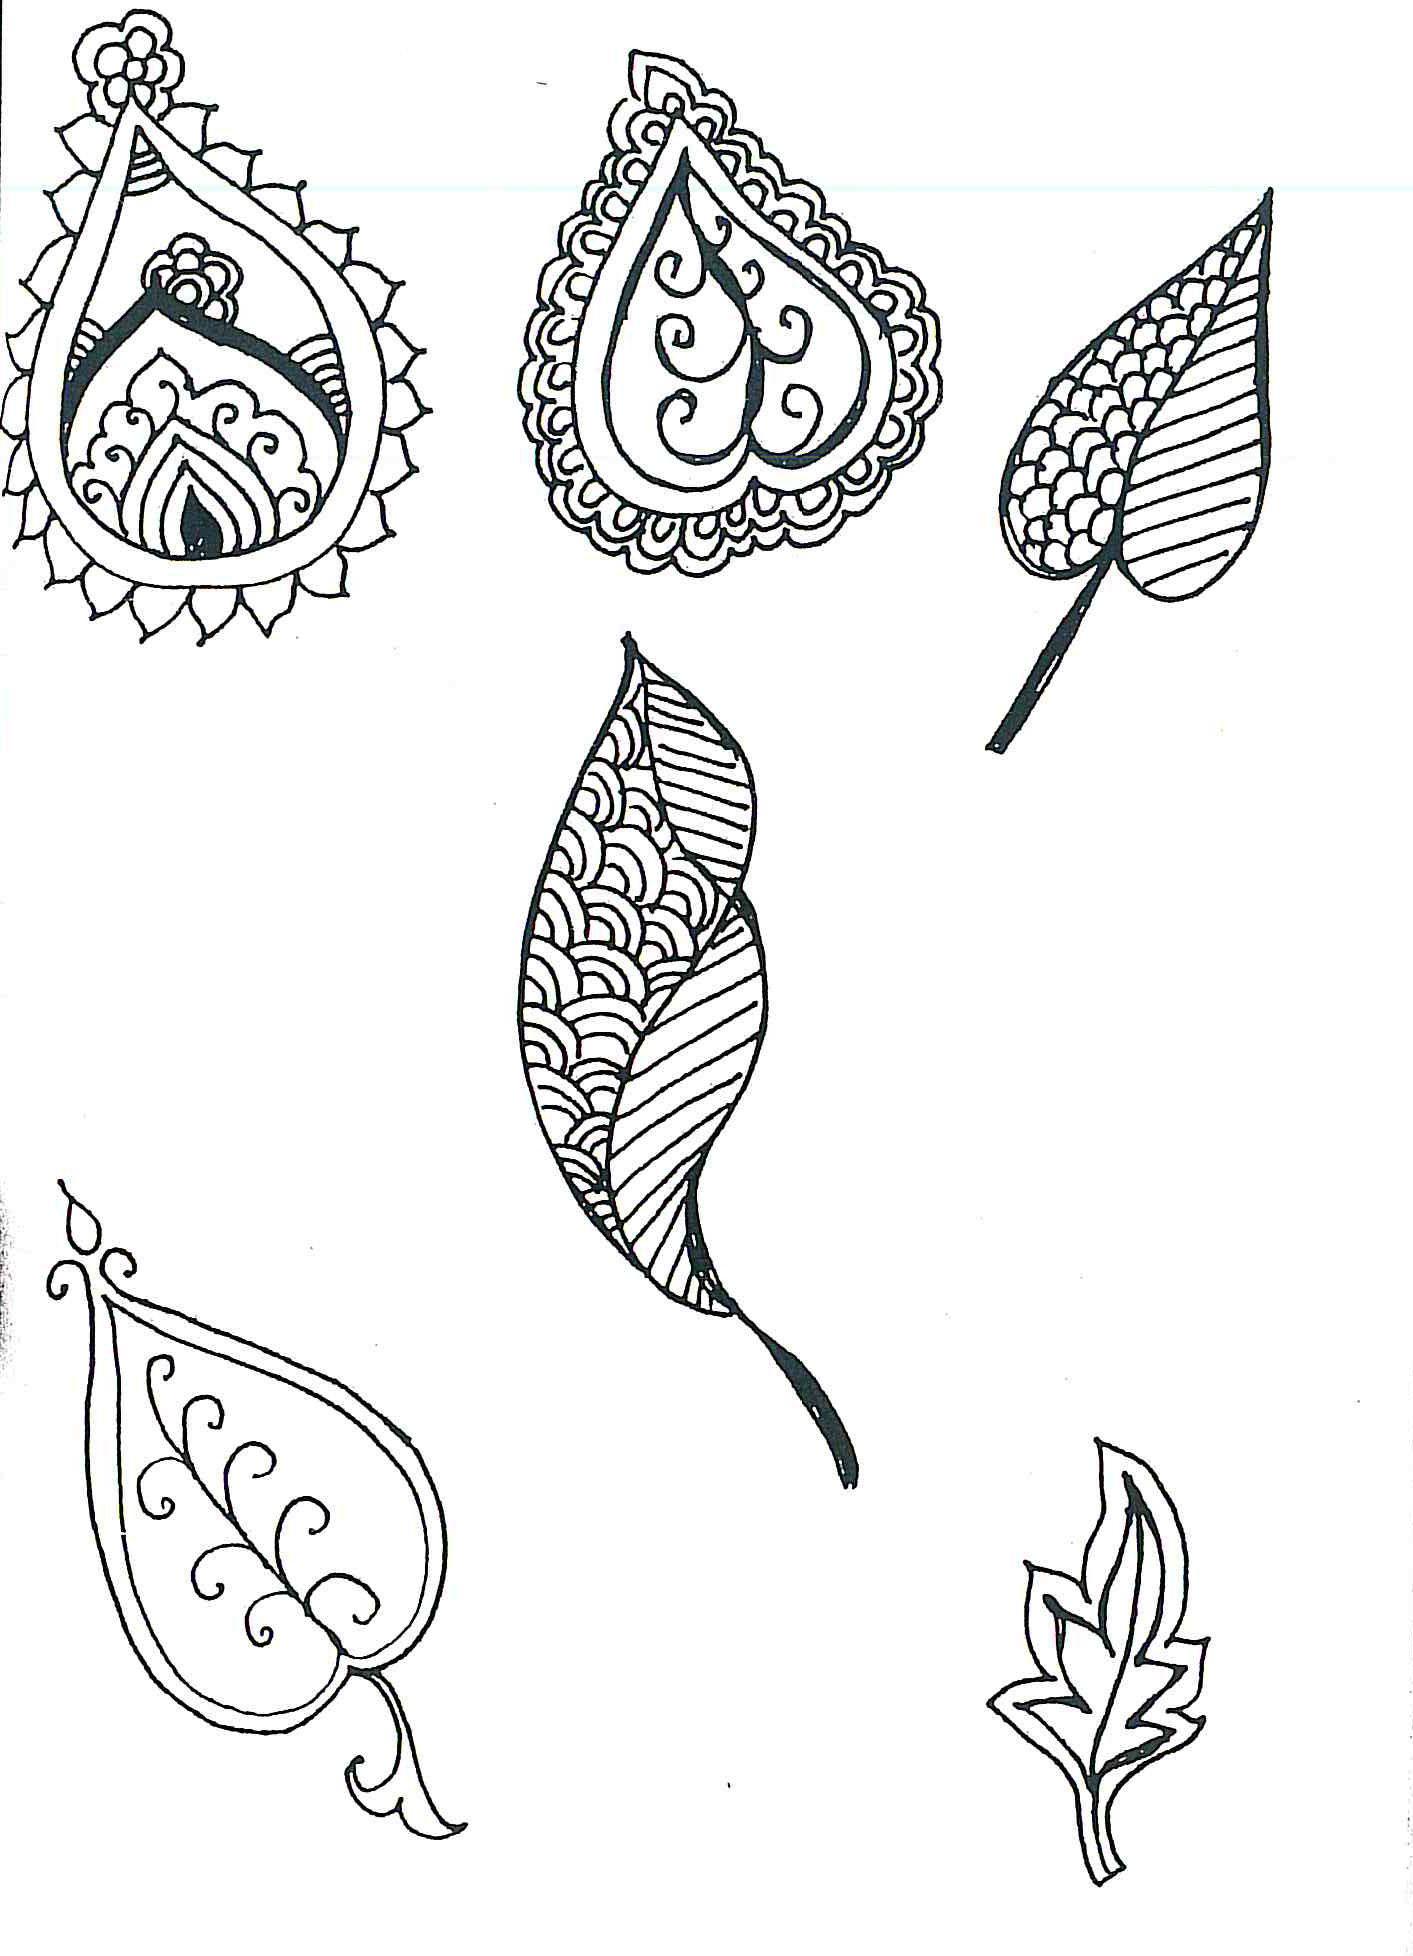 dibujos dificiles para colorear - Buscar con Google | Mandalas ...